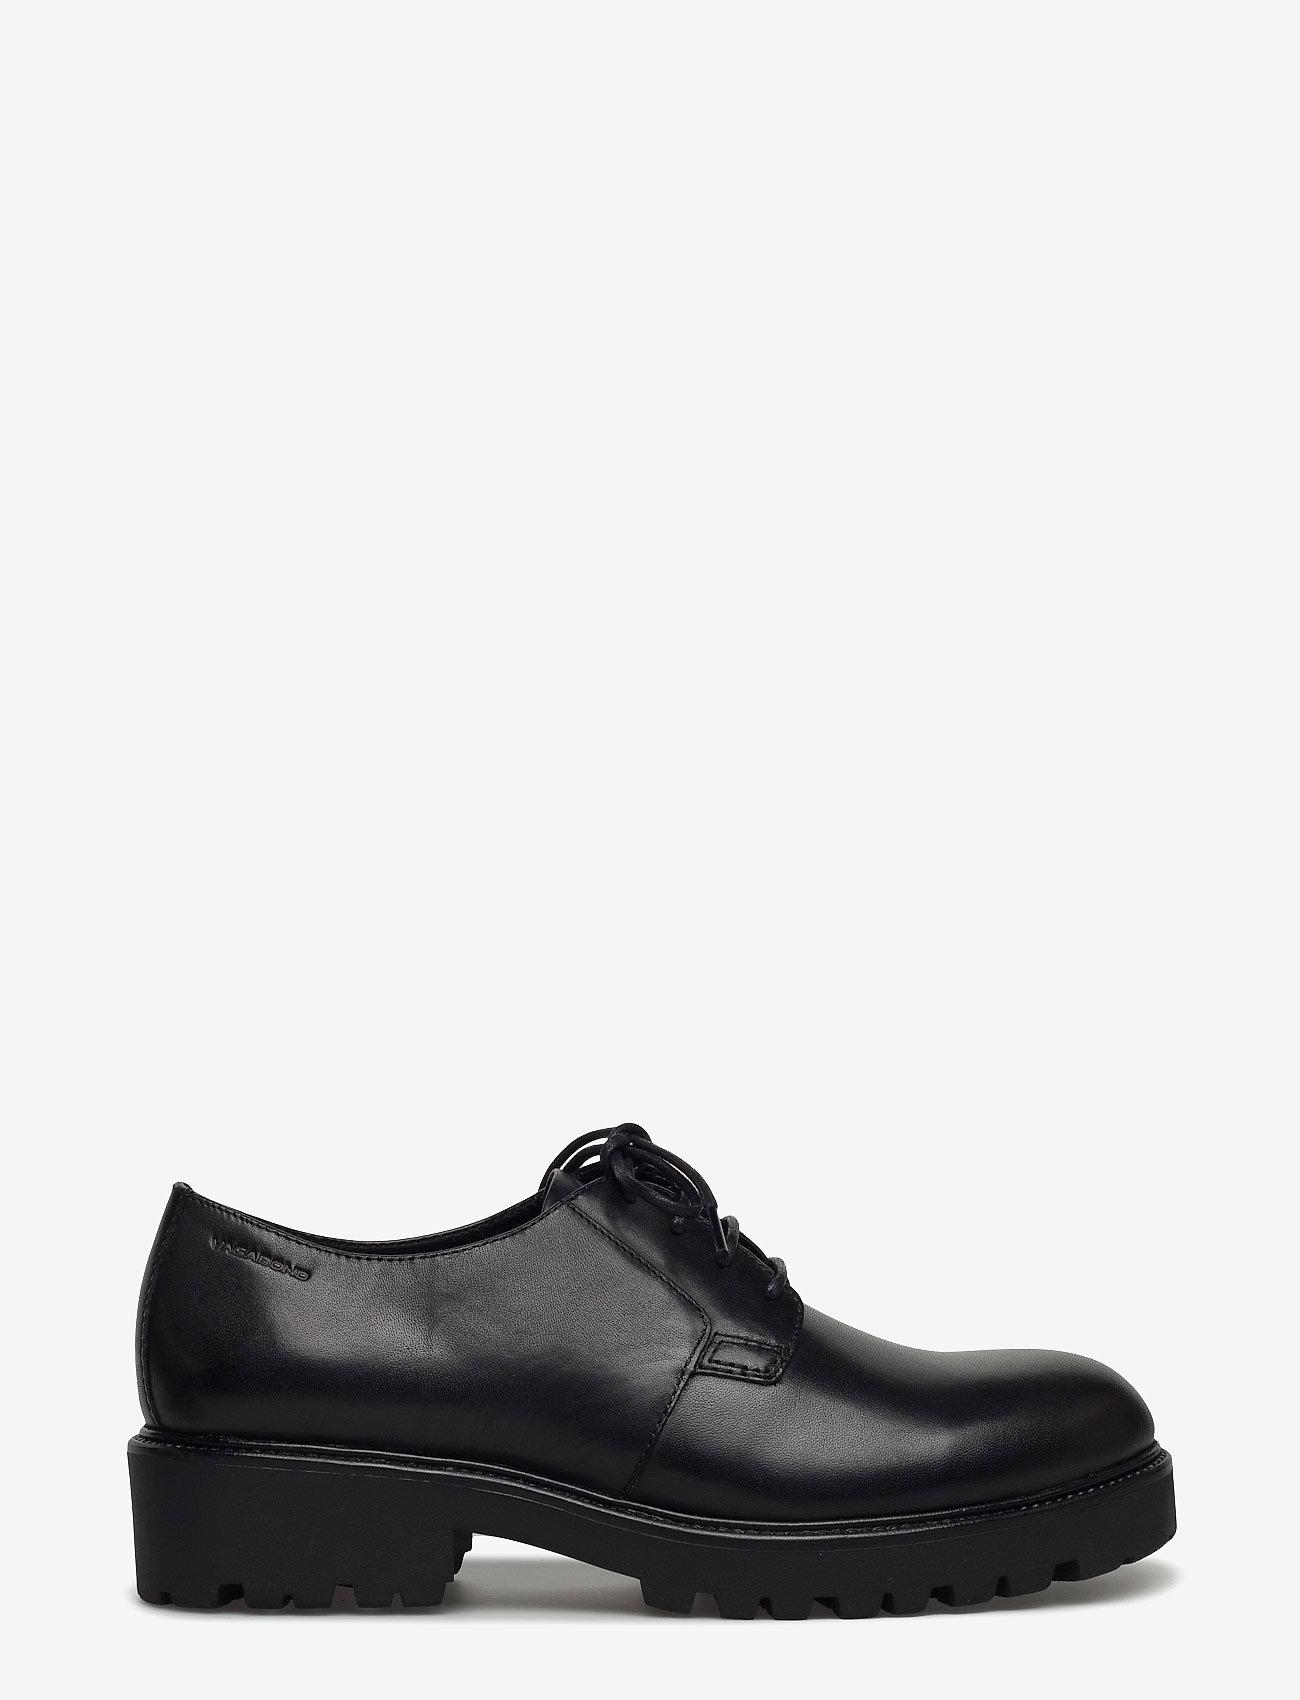 VAGABOND - KENOVA - buty sznurowane - black - 1